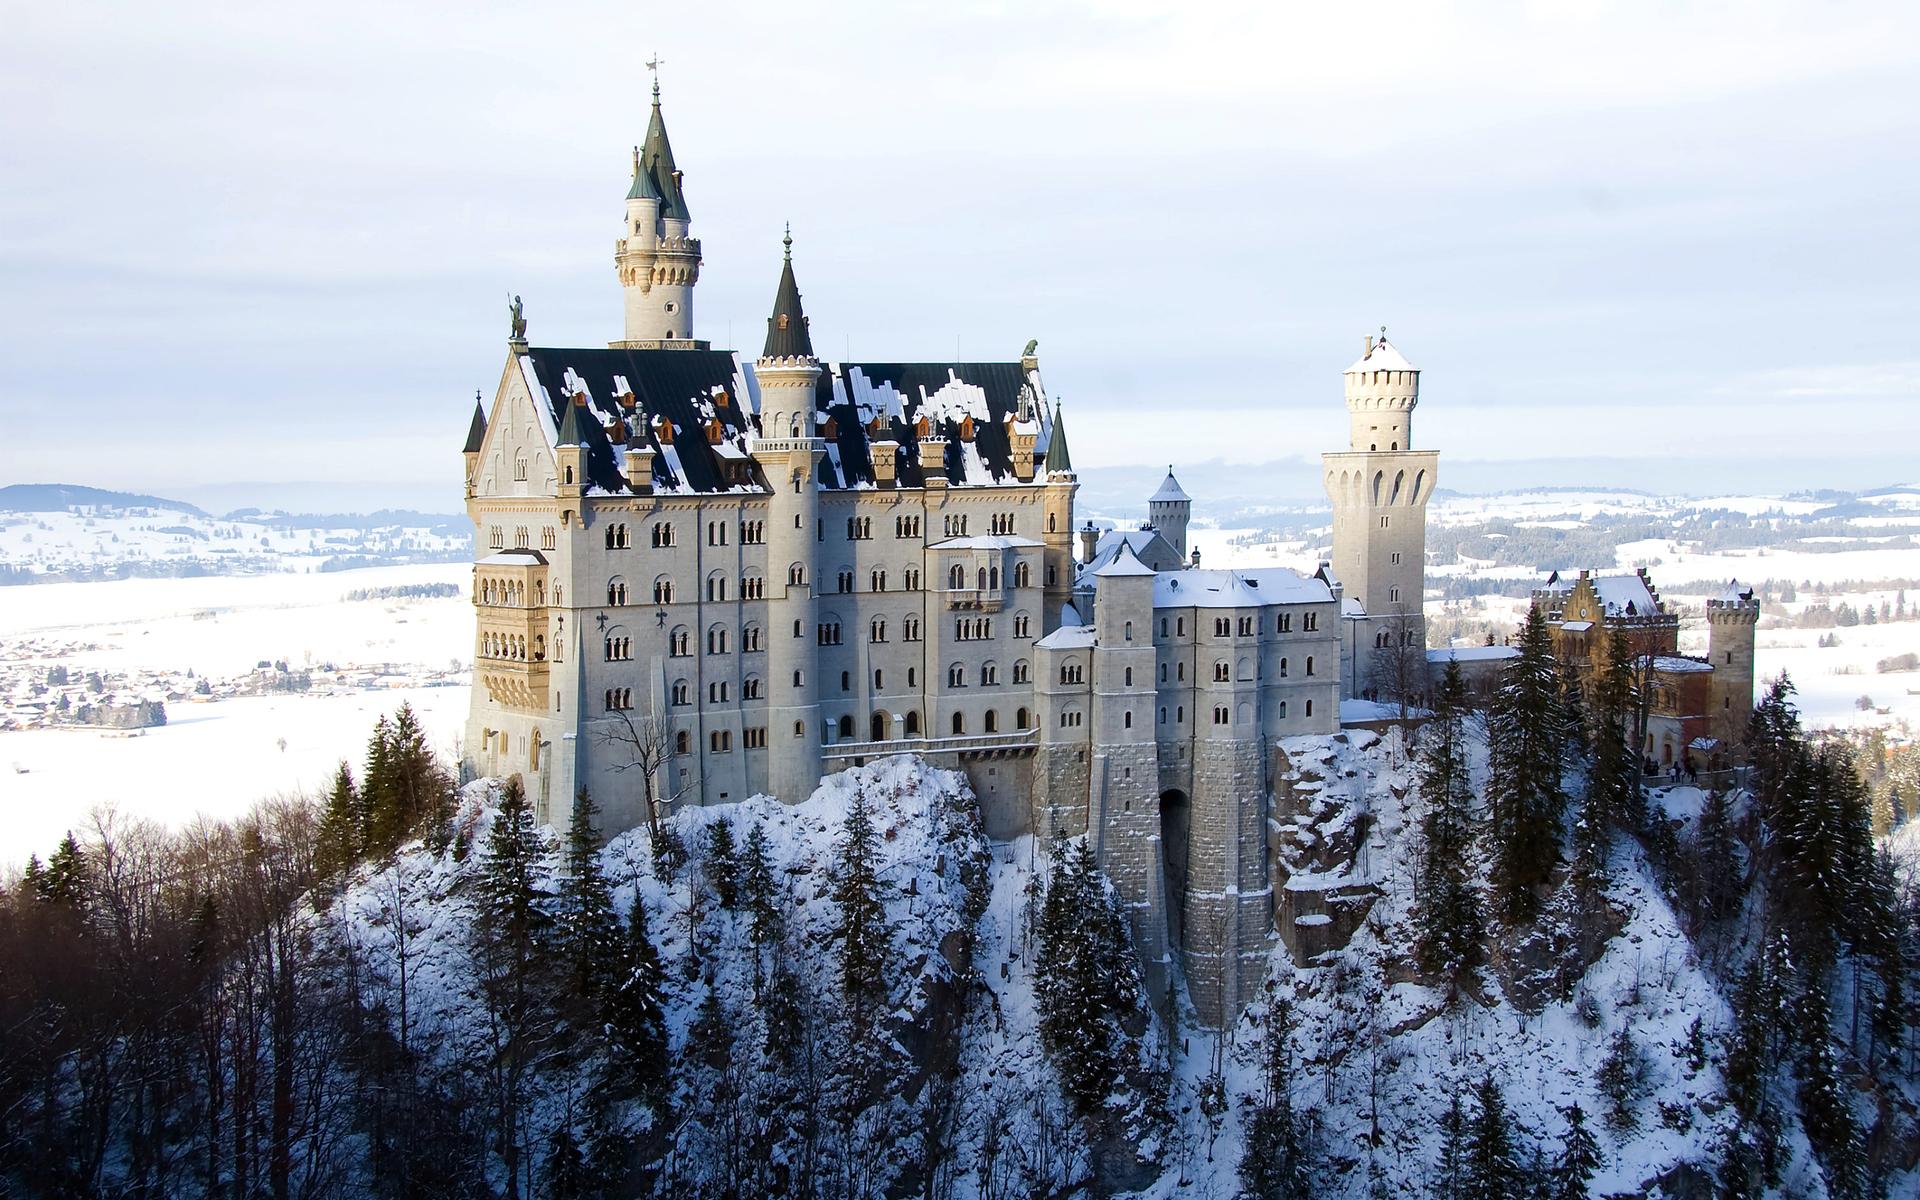 Castle Neuschwanstein Wallpaper Germany Photographic HD Desktop 1920x1200